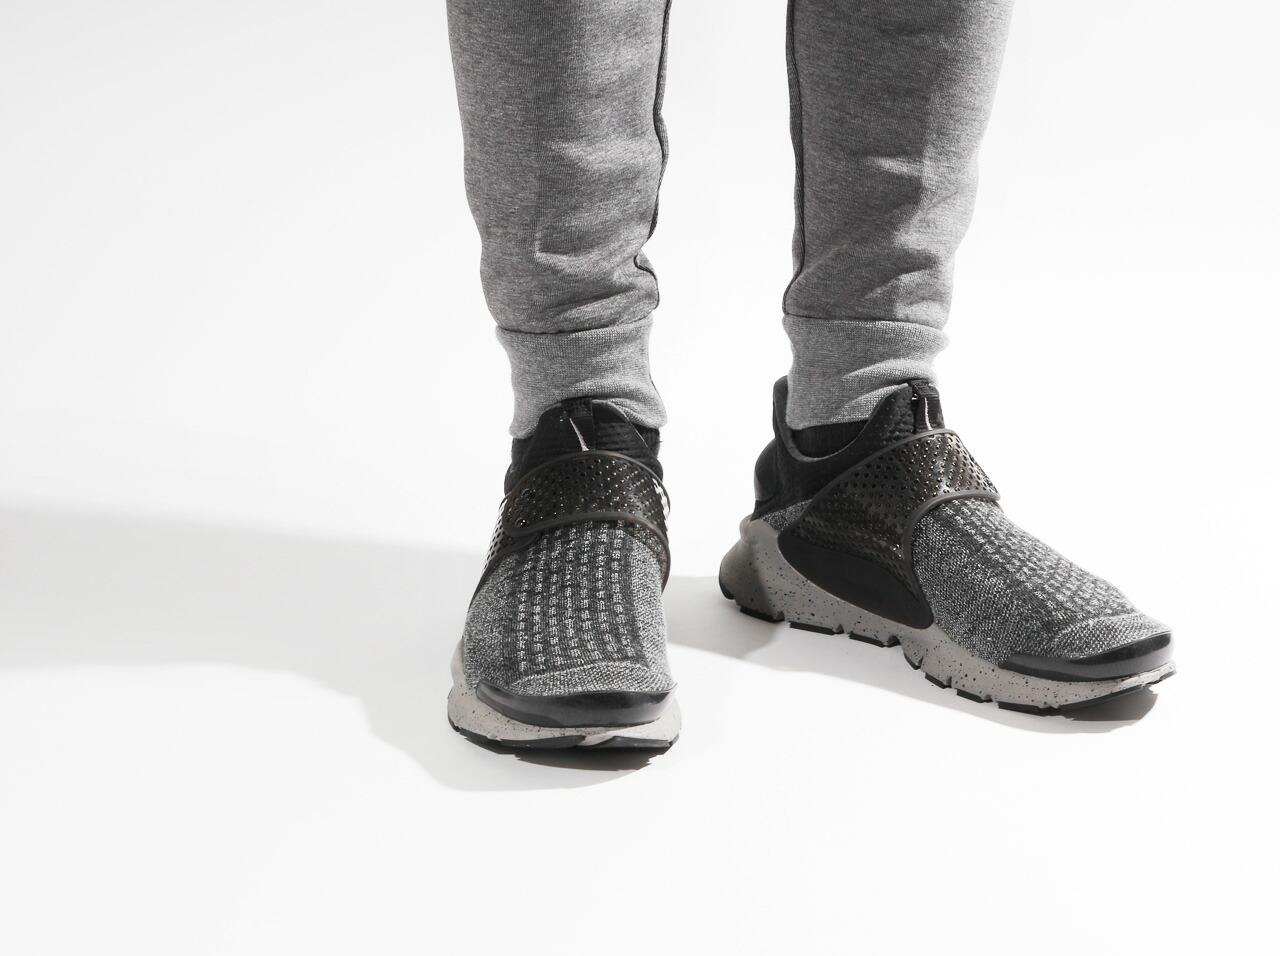 newest collection 6e852 eedaa nike lunarglide vs zoom pegasus softball turf shoes women